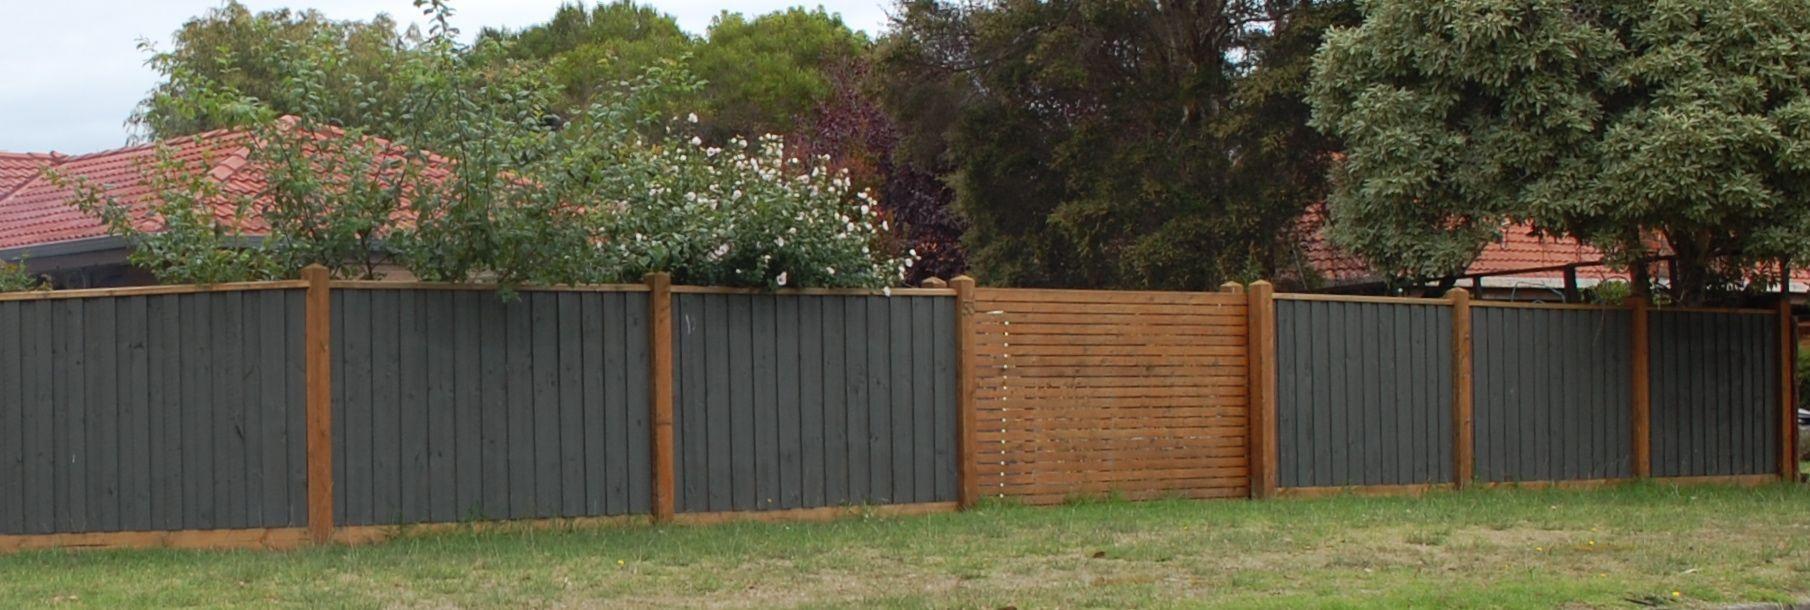 20 Wondrous Cool Tips Fence Photography Gates brick fence with ...